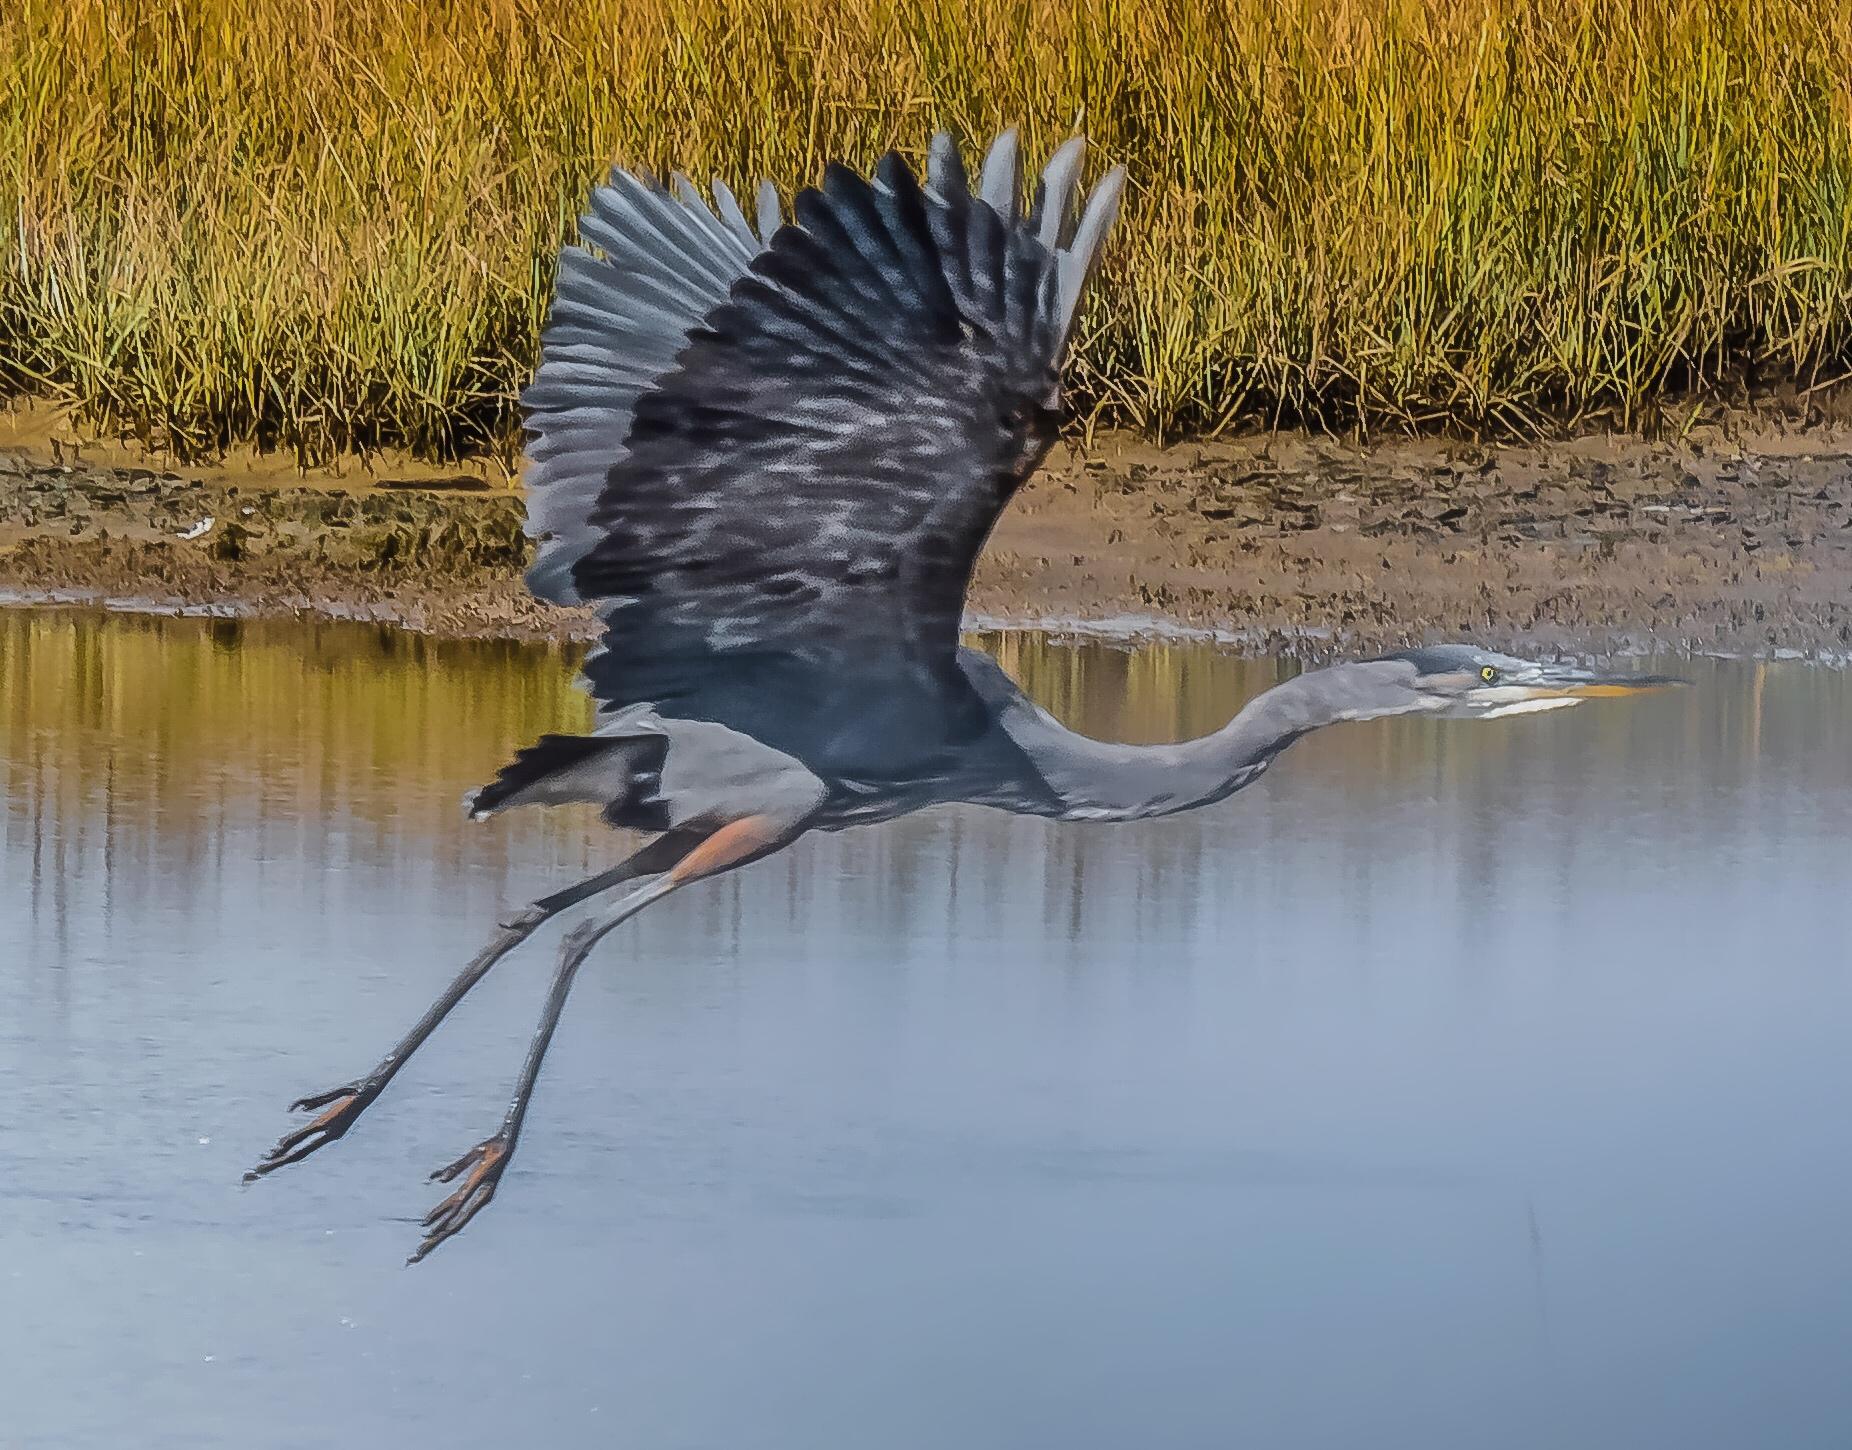 Little Blue Heron flyung over Salt Matsh with wings fully extended